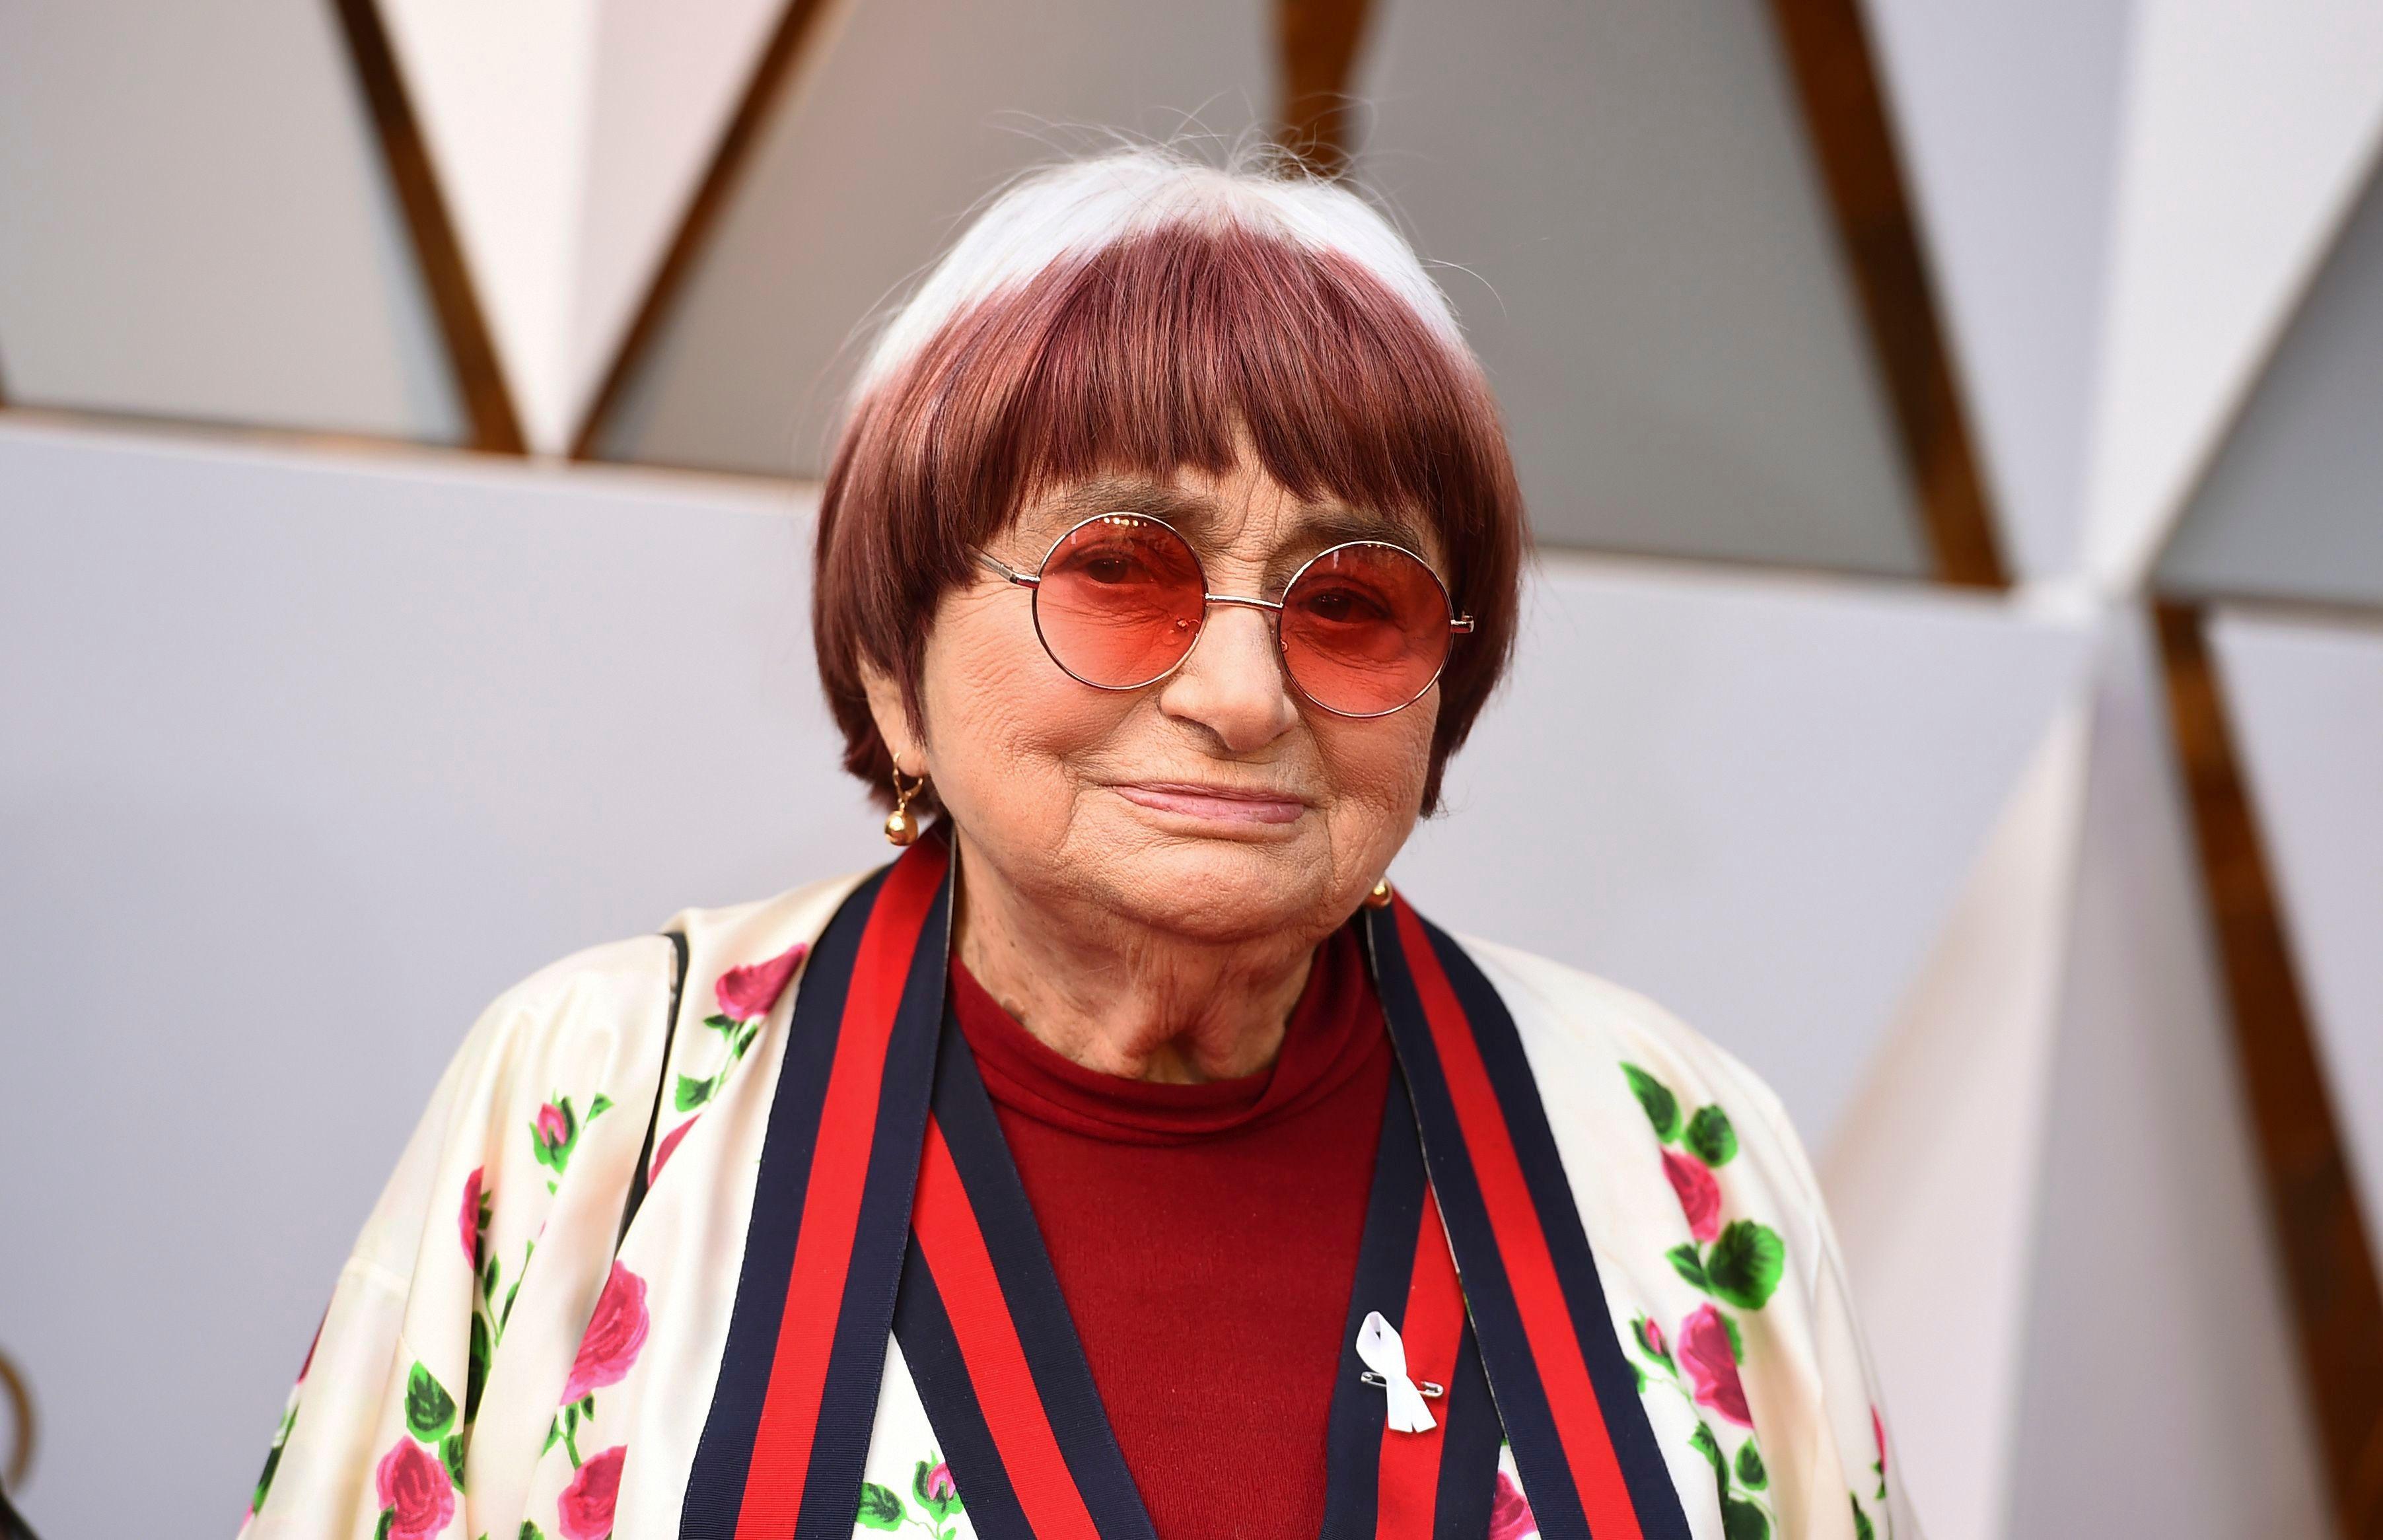 Image result for Agnes Varda, the grande dame of French cinema, dies aged 90